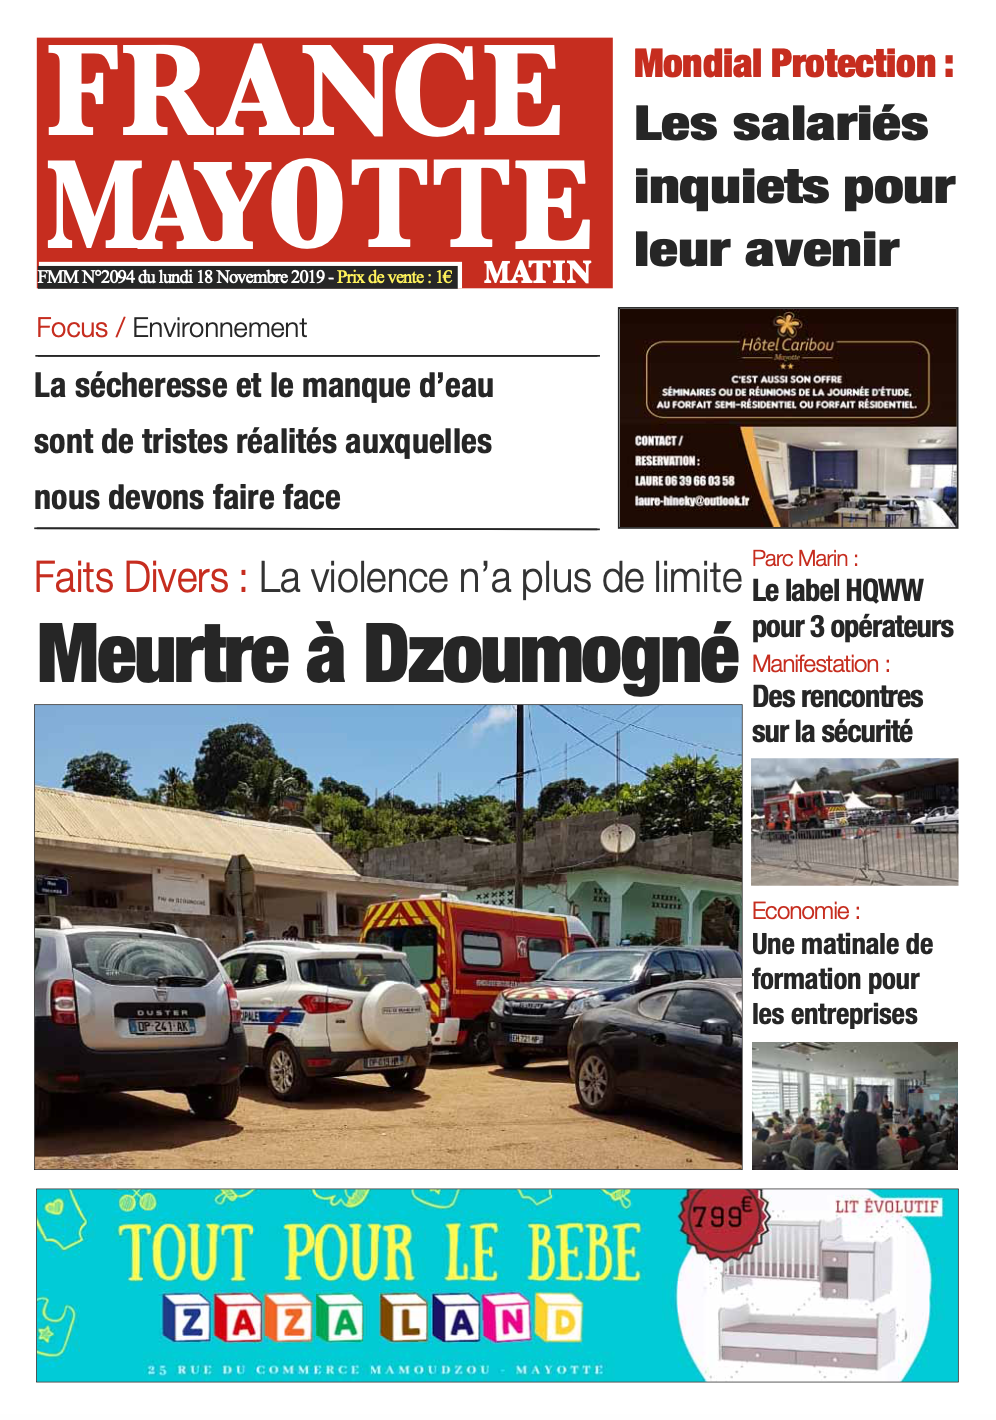 France Mayotte Lundi 18 novembre 2019